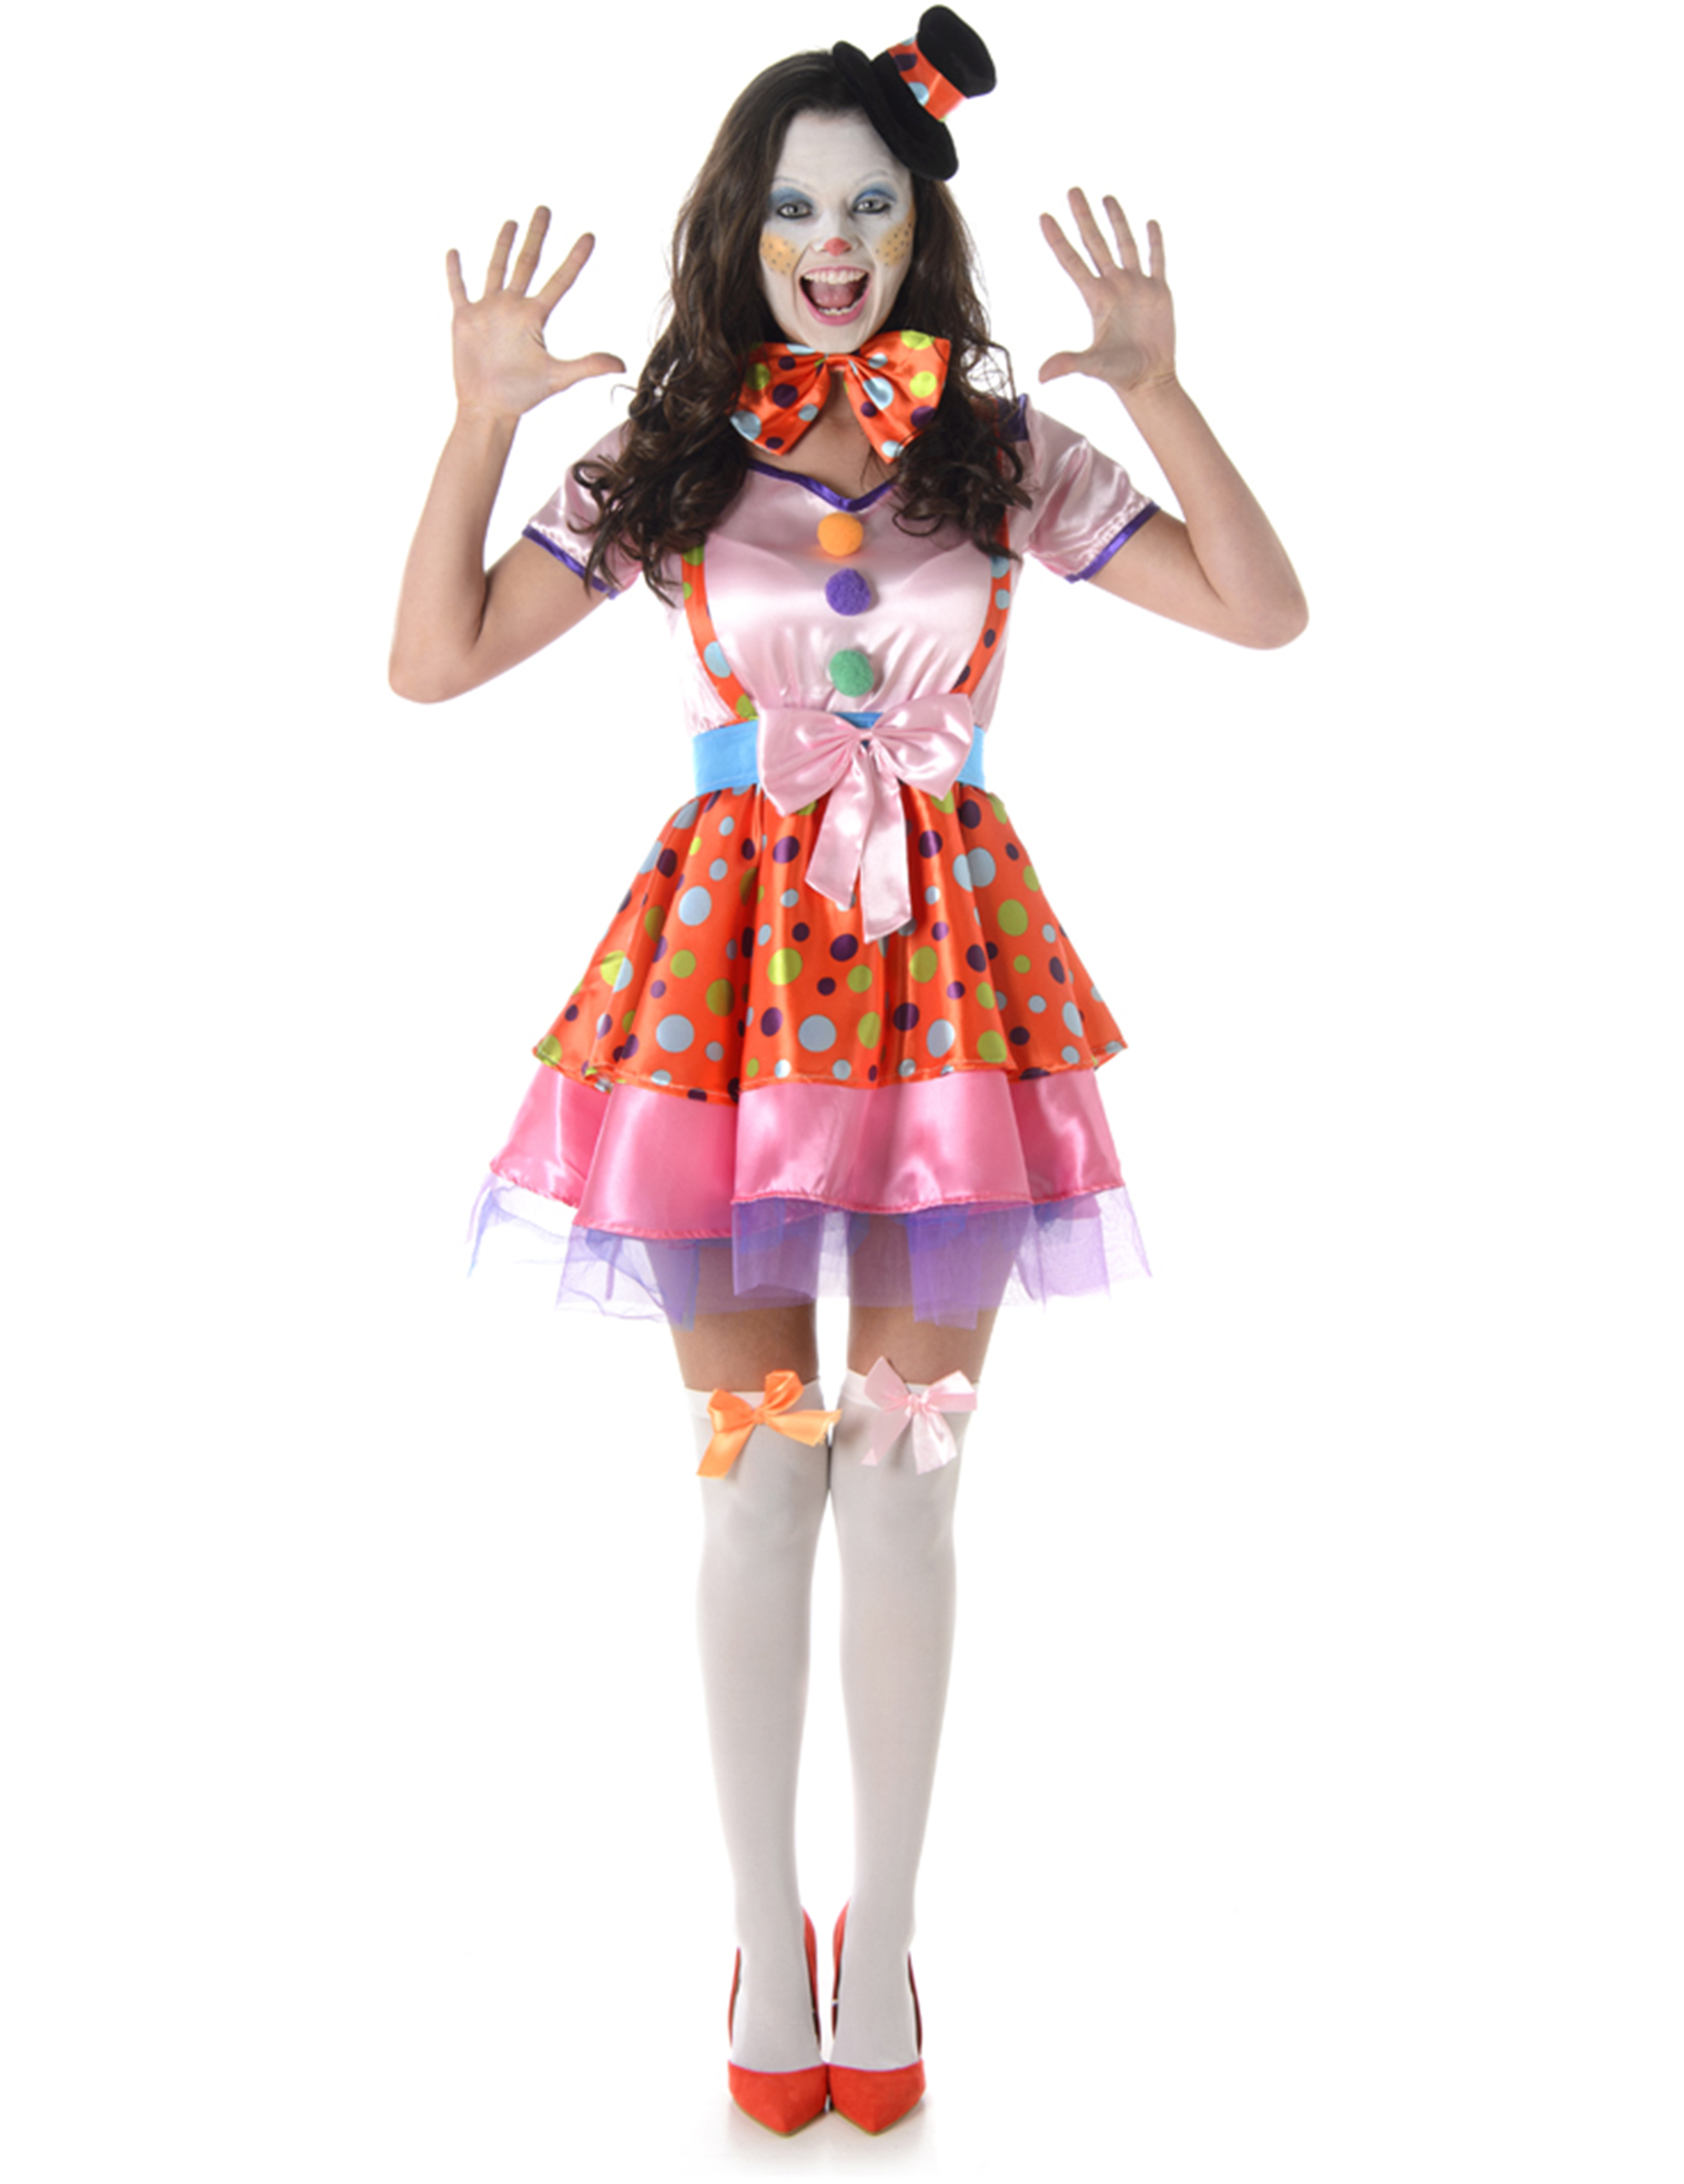 07c7186858 Costume da clown donna: Costumi adulti,e vestiti di carnevale online ...